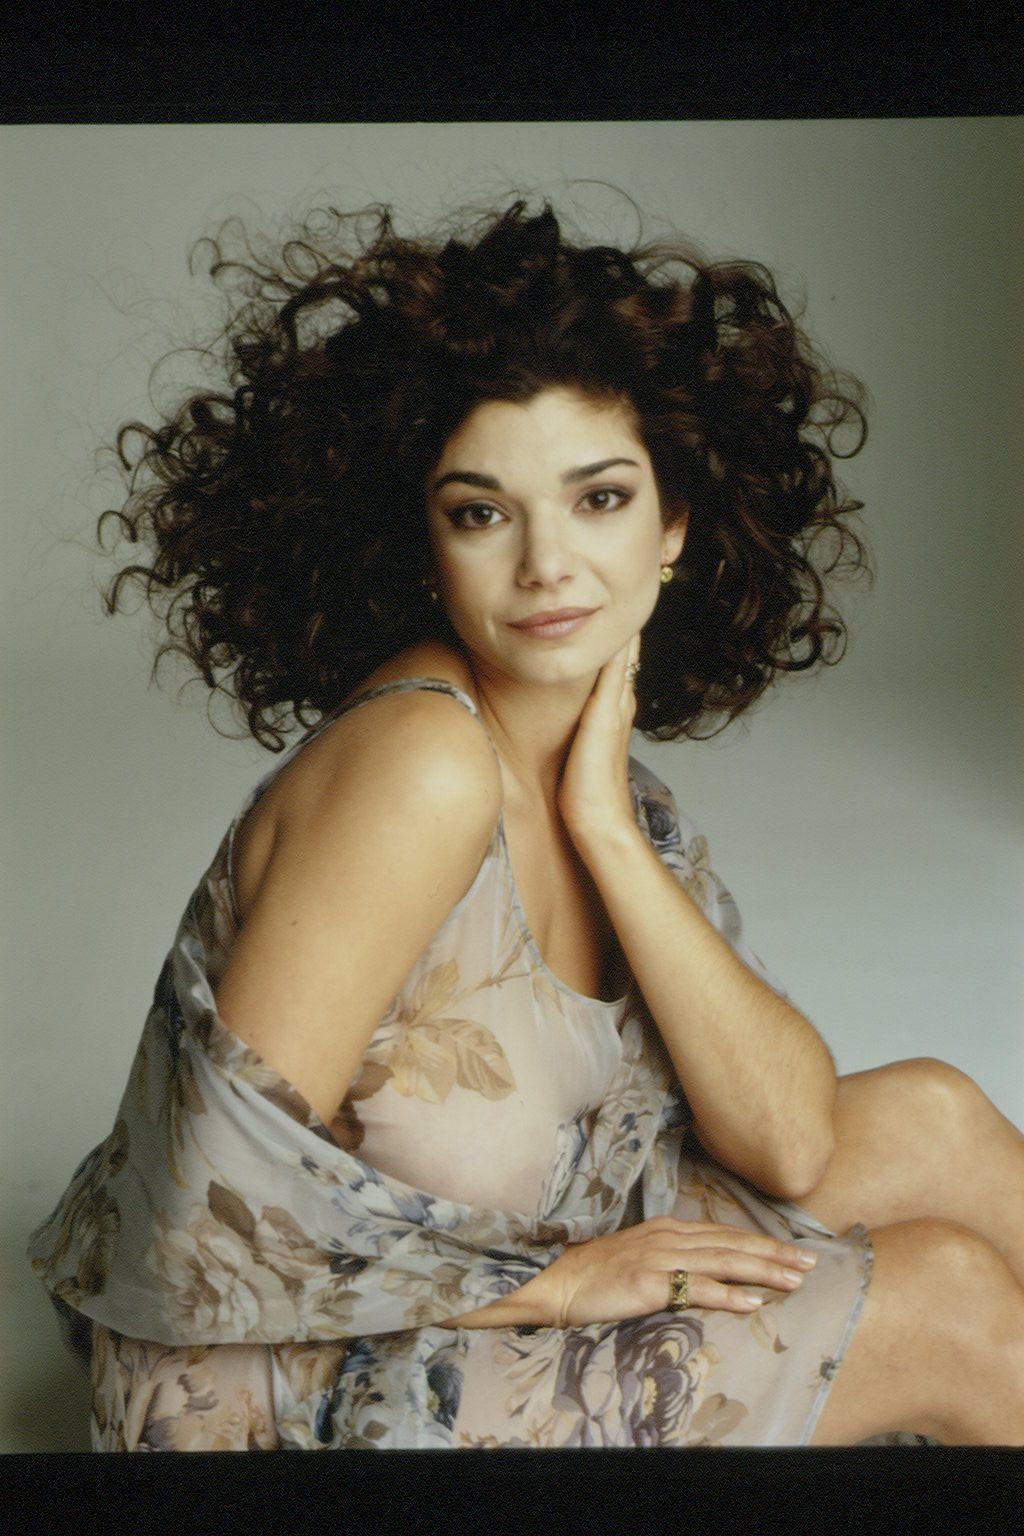 Laura San Giacomo